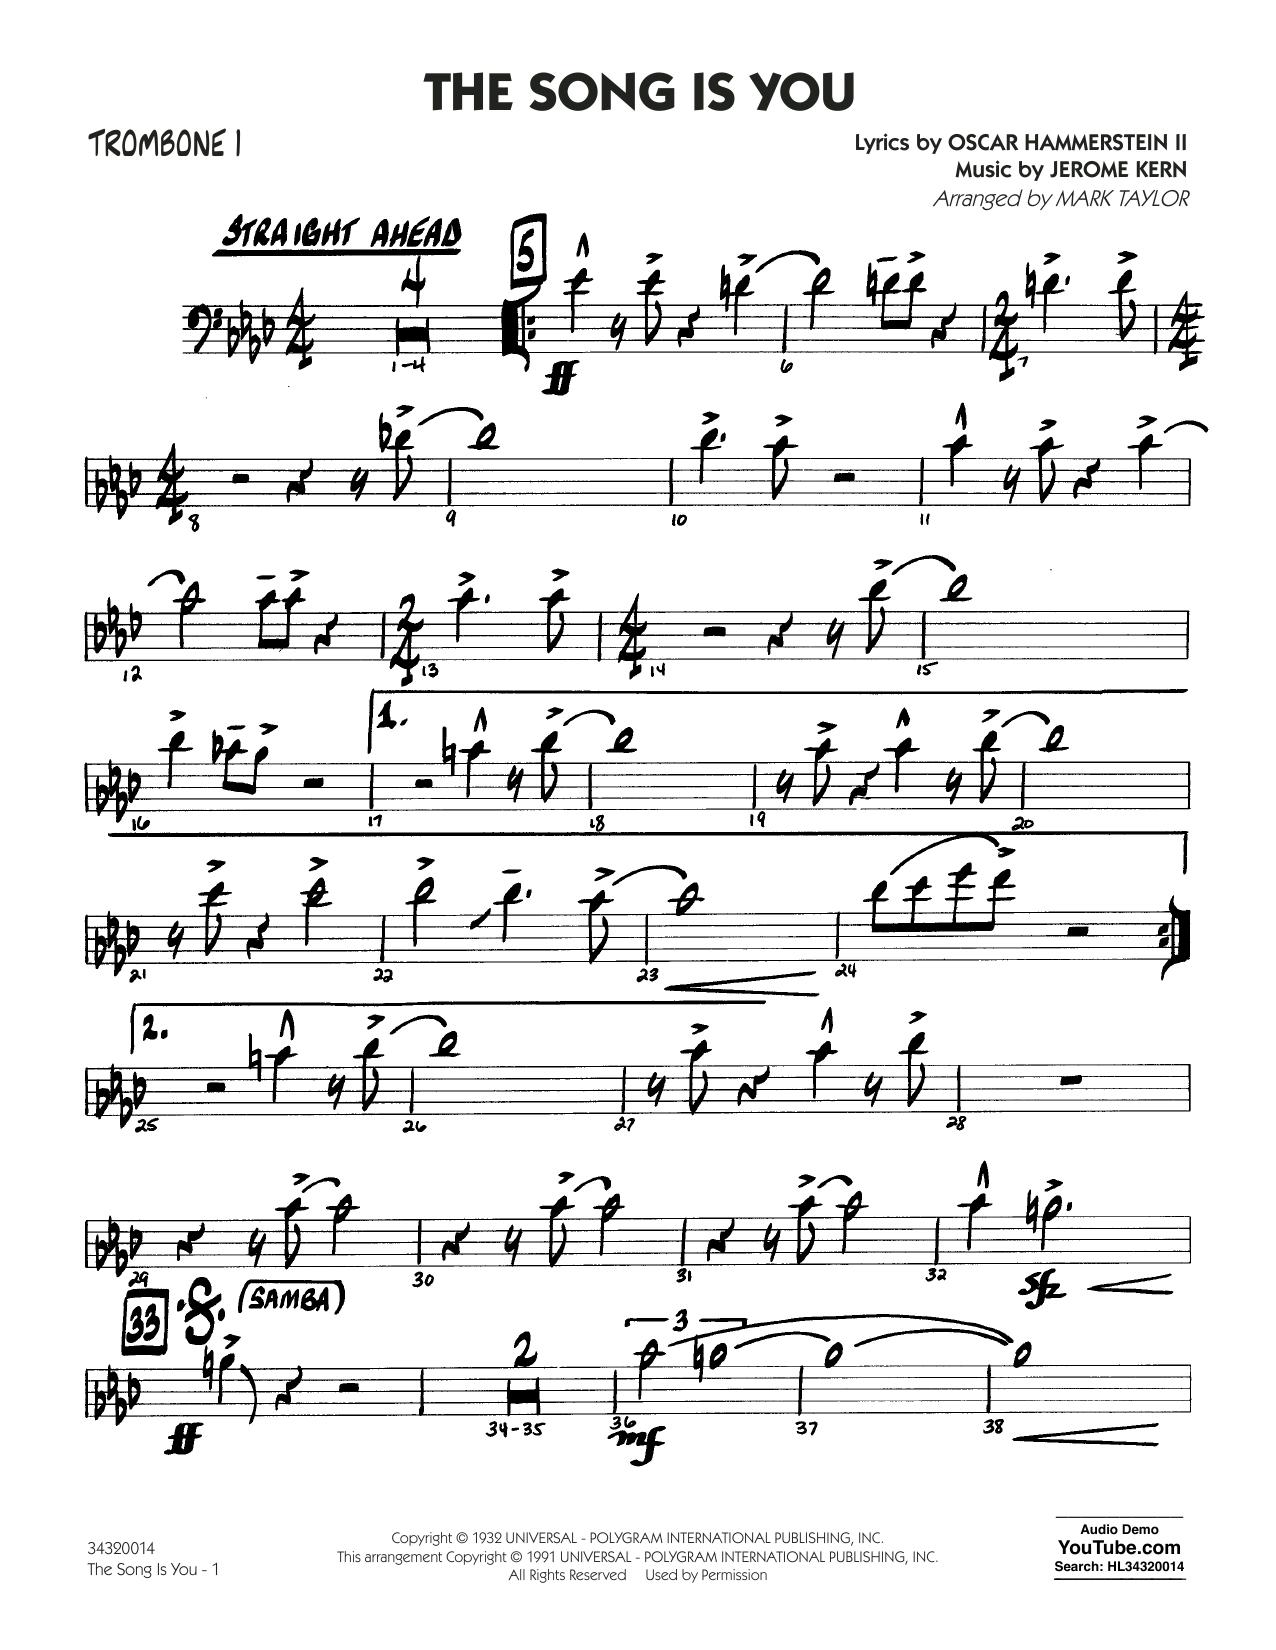 Oscar Hammerstein II - The Song Is You - Trombone 1